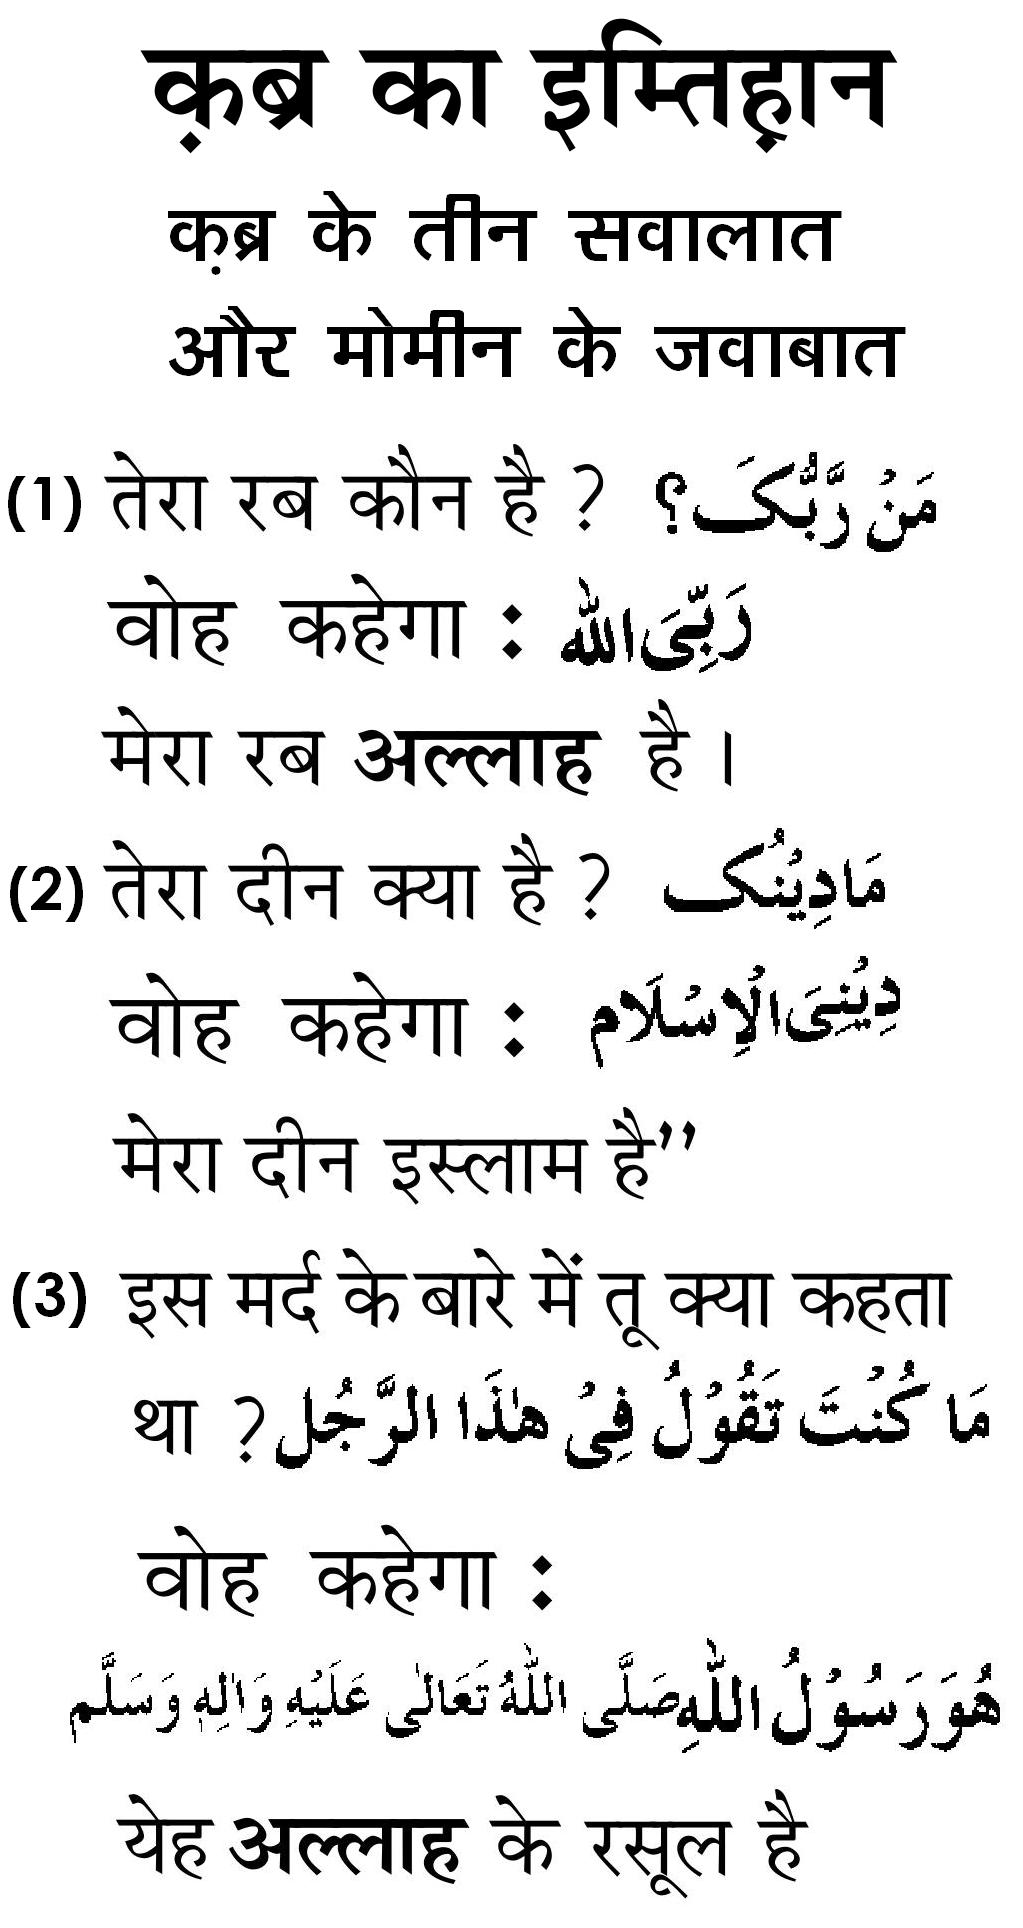 Qabr Ke Sawal O Jawab